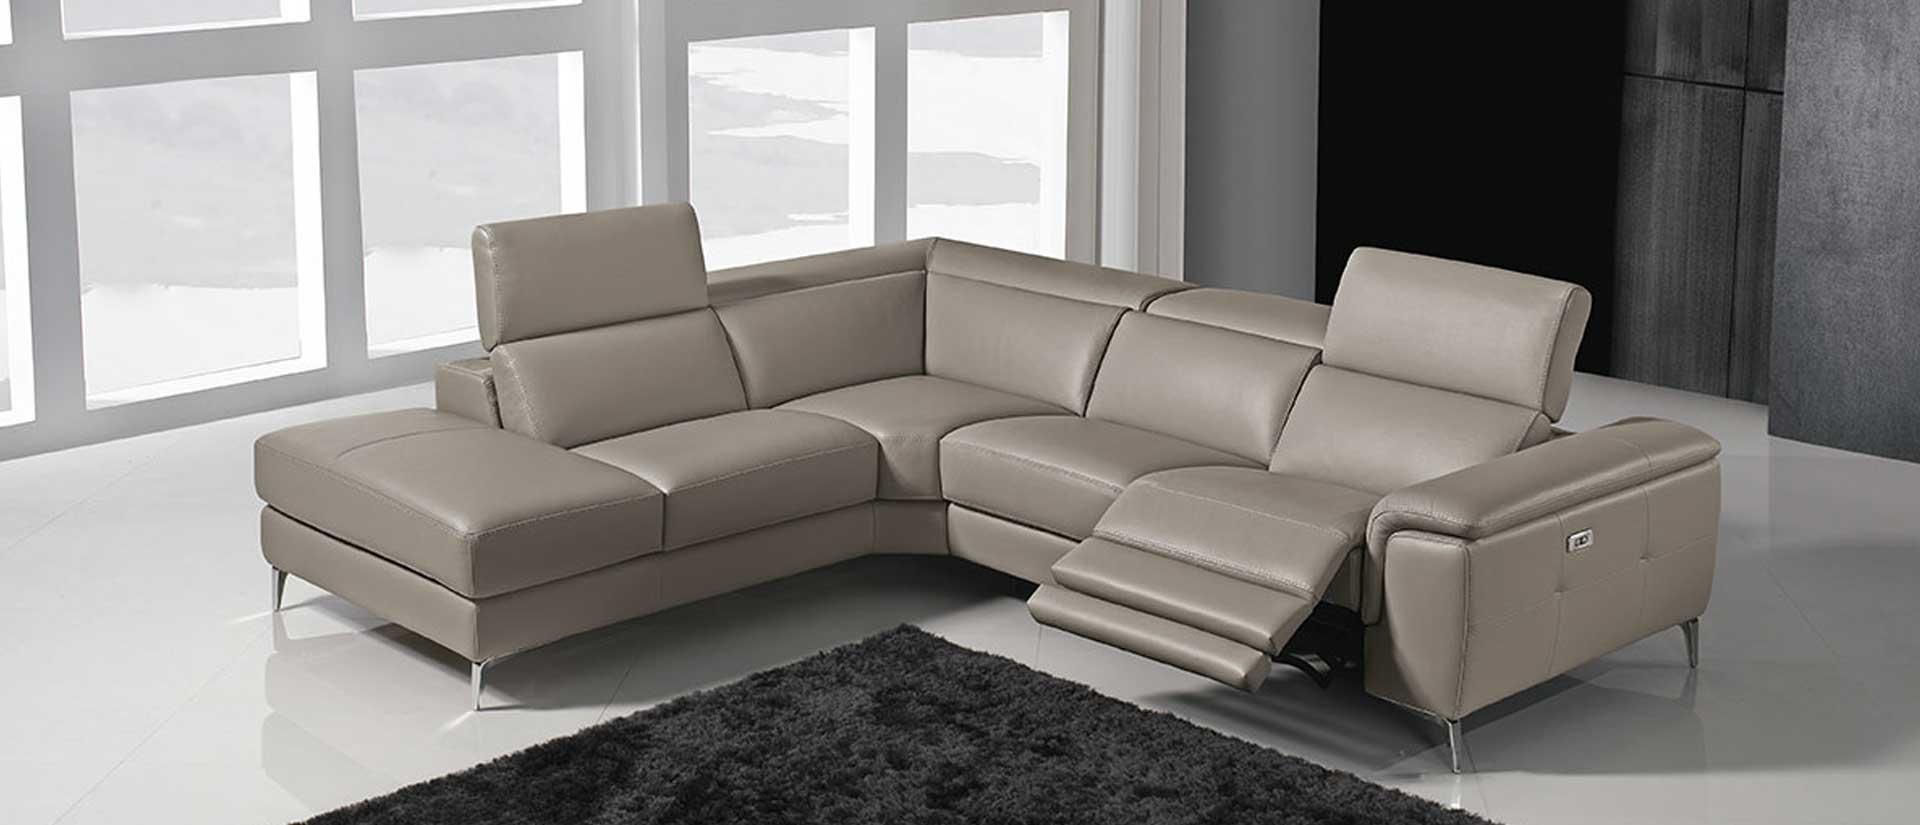 vendita divani classici divani moderni campania - casadesign